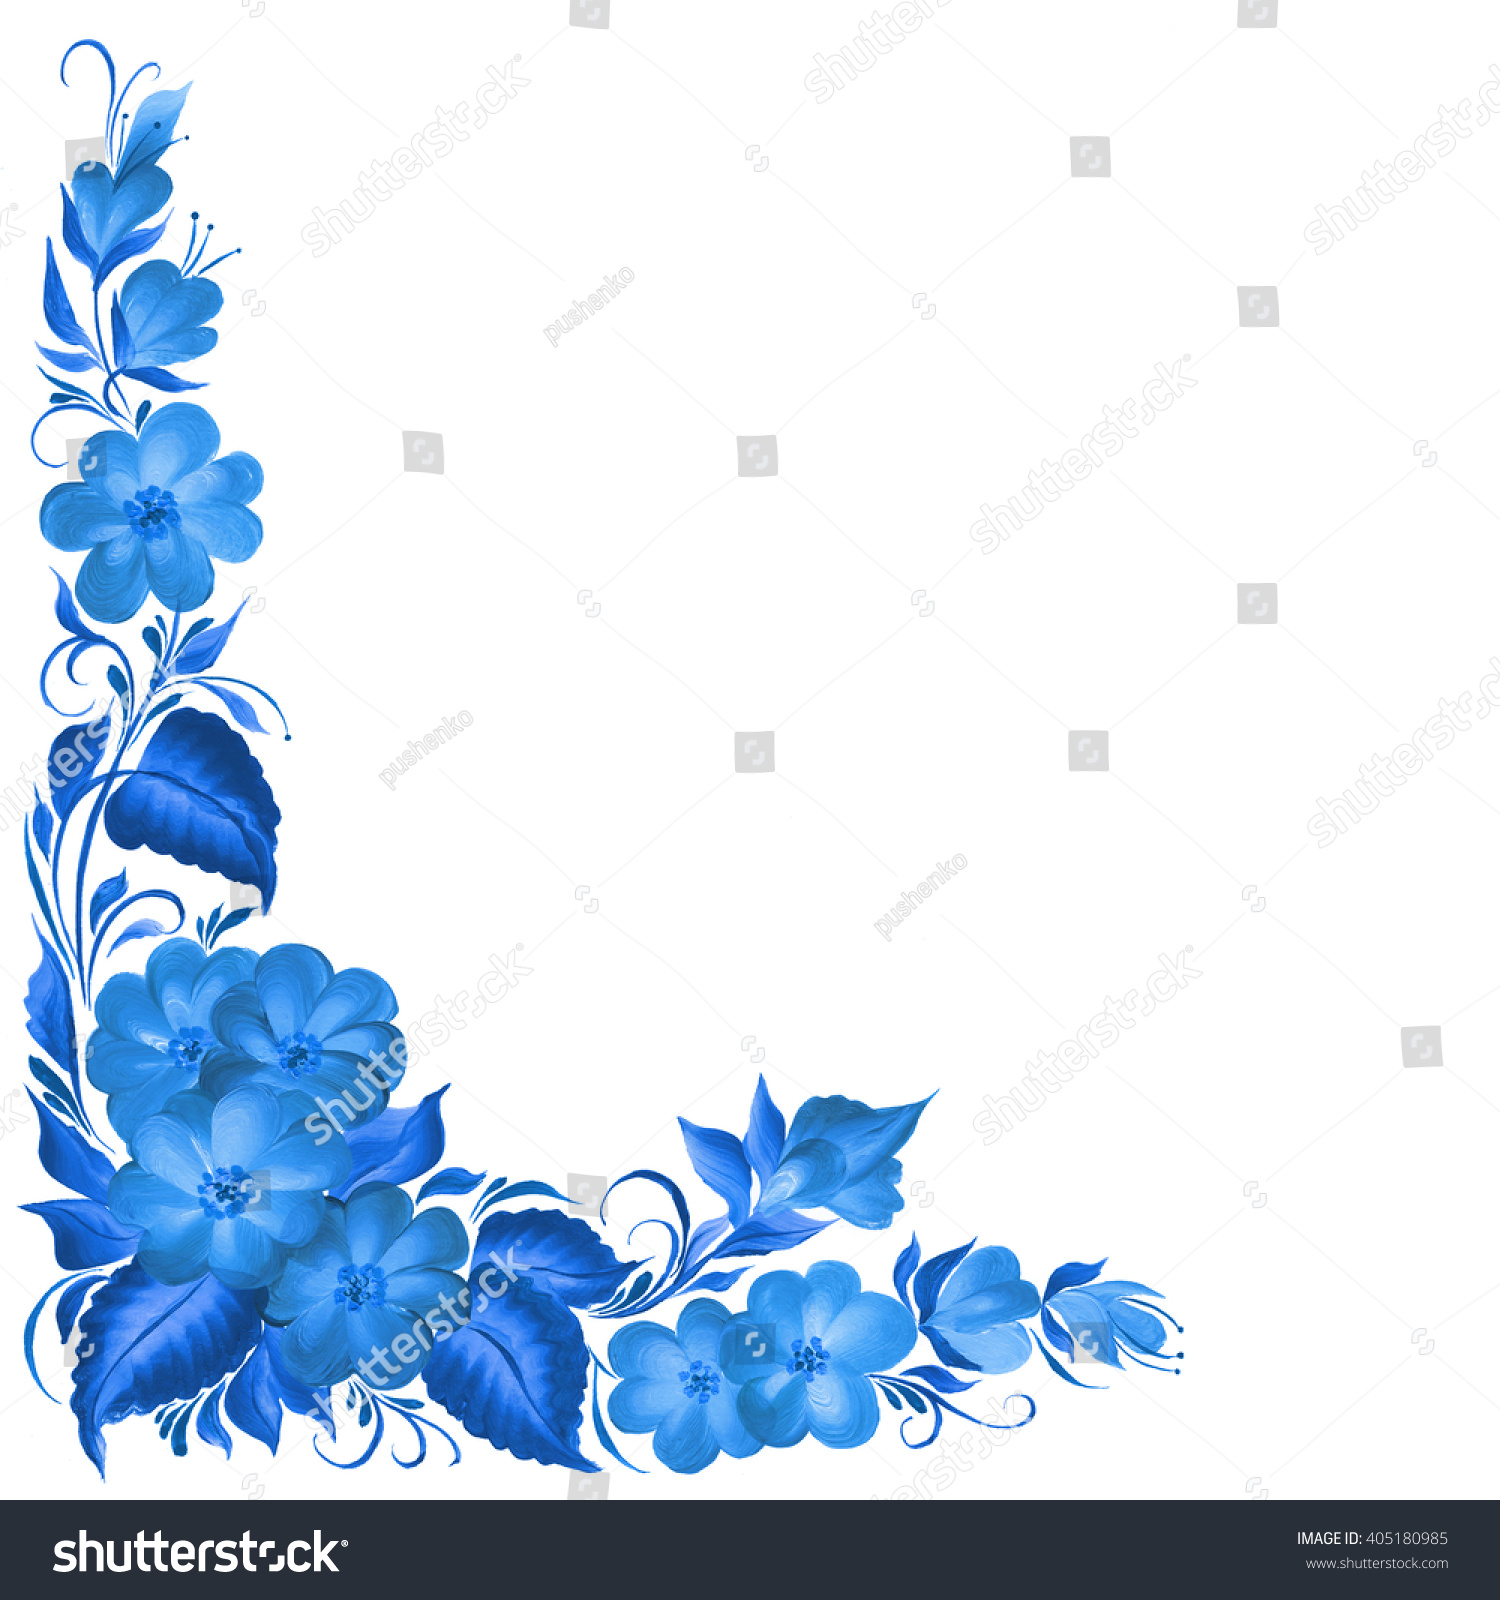 Frame flowers design beautiful design background stock illustration frame with flowers for design beautiful design background with blue flowers izmirmasajfo